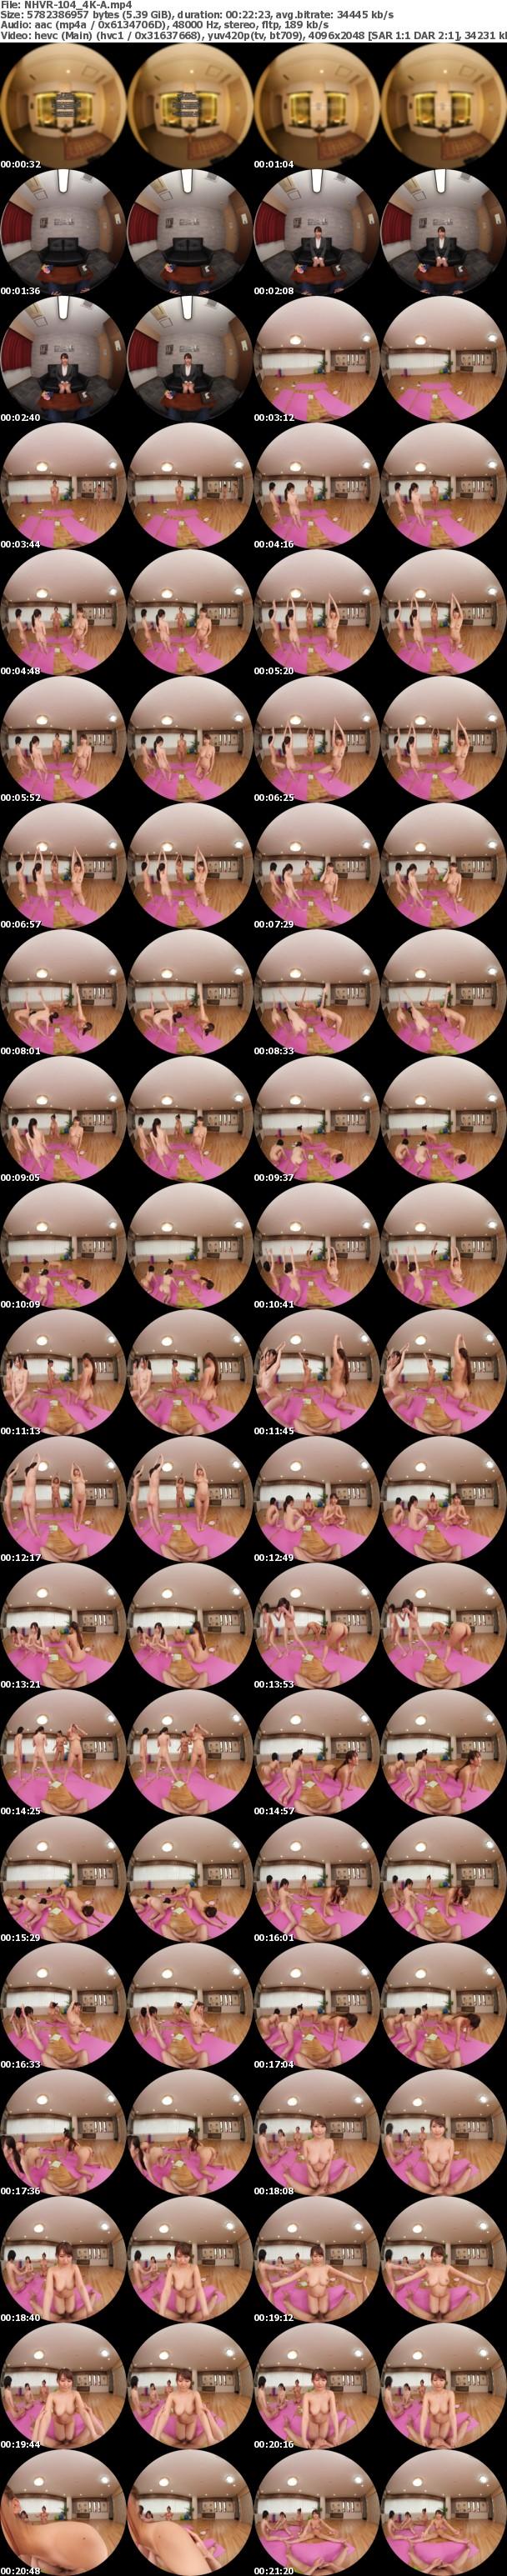 (VR) (4K) NHVR-104 全裸ヨガ教室潜入 VR